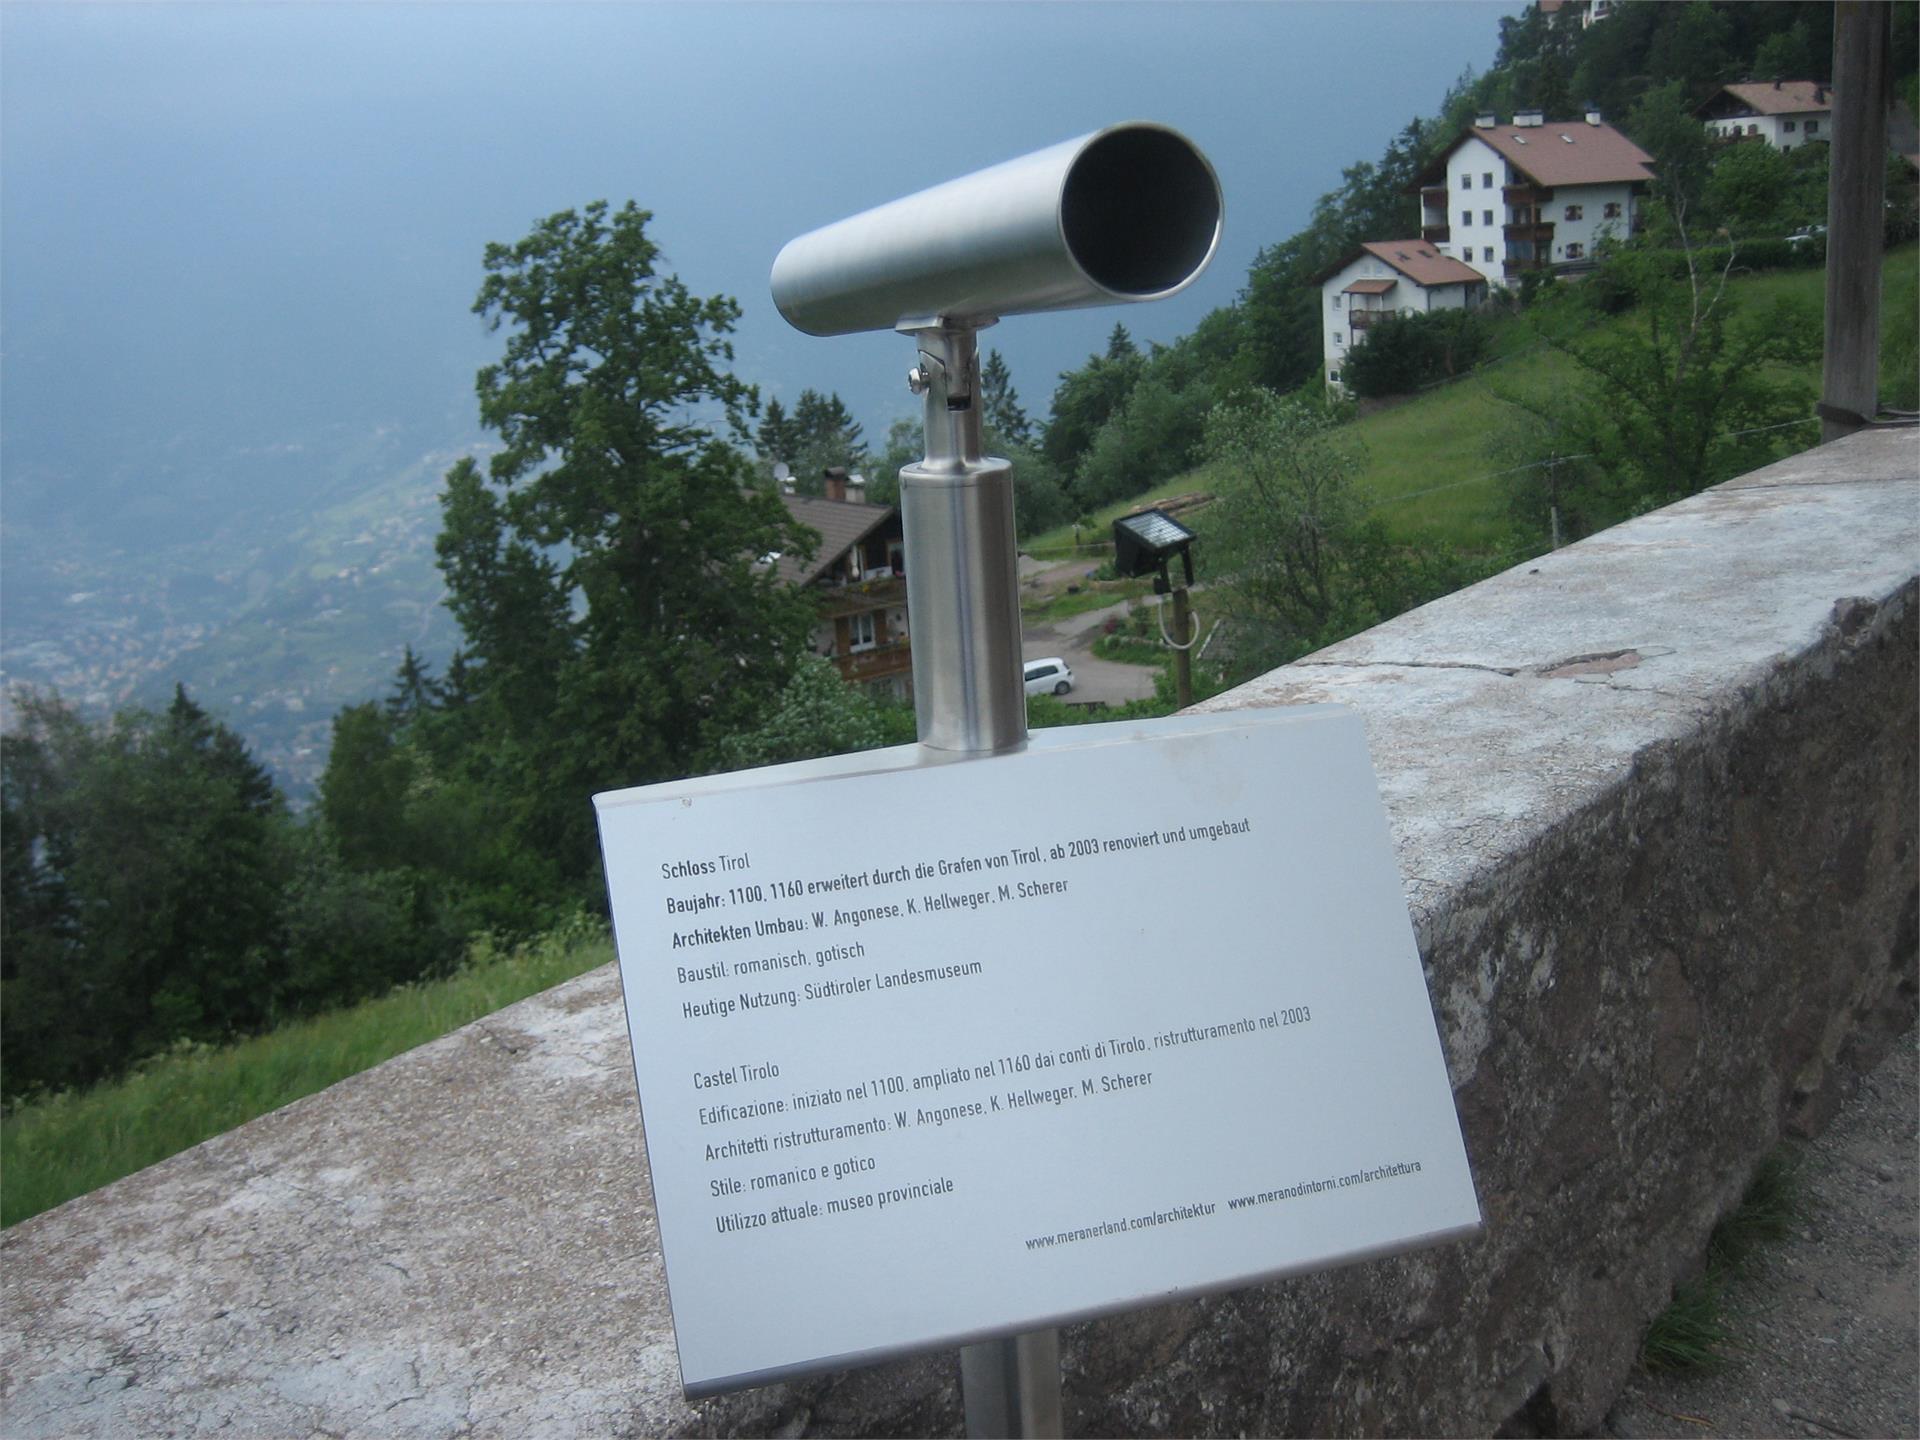 Tyrol Castle - Telescope St. Kathrein Kirchlein Church